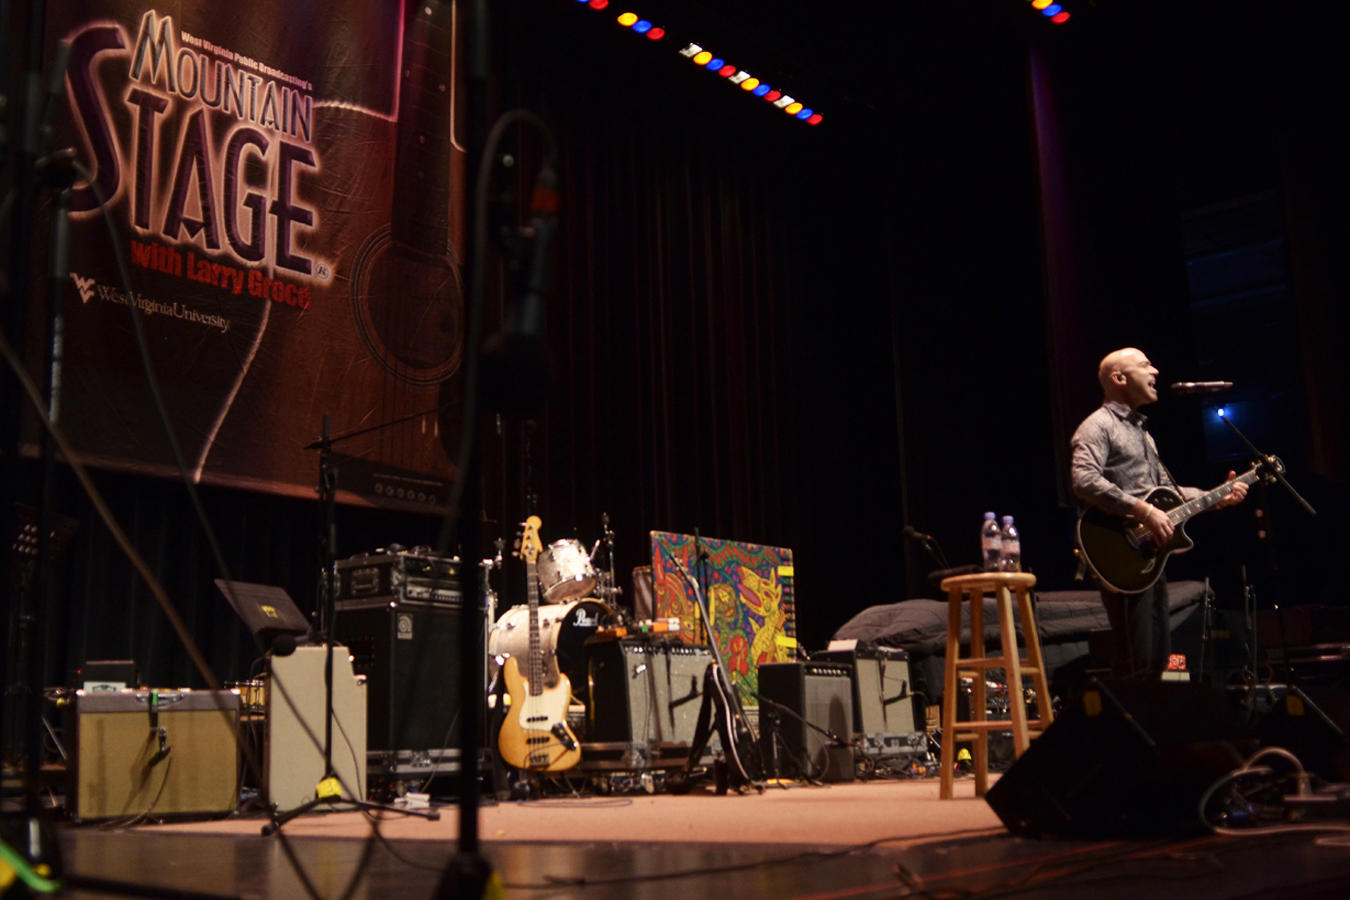 Ed Kowalczyk On Mountain Stage | NPR Illinois